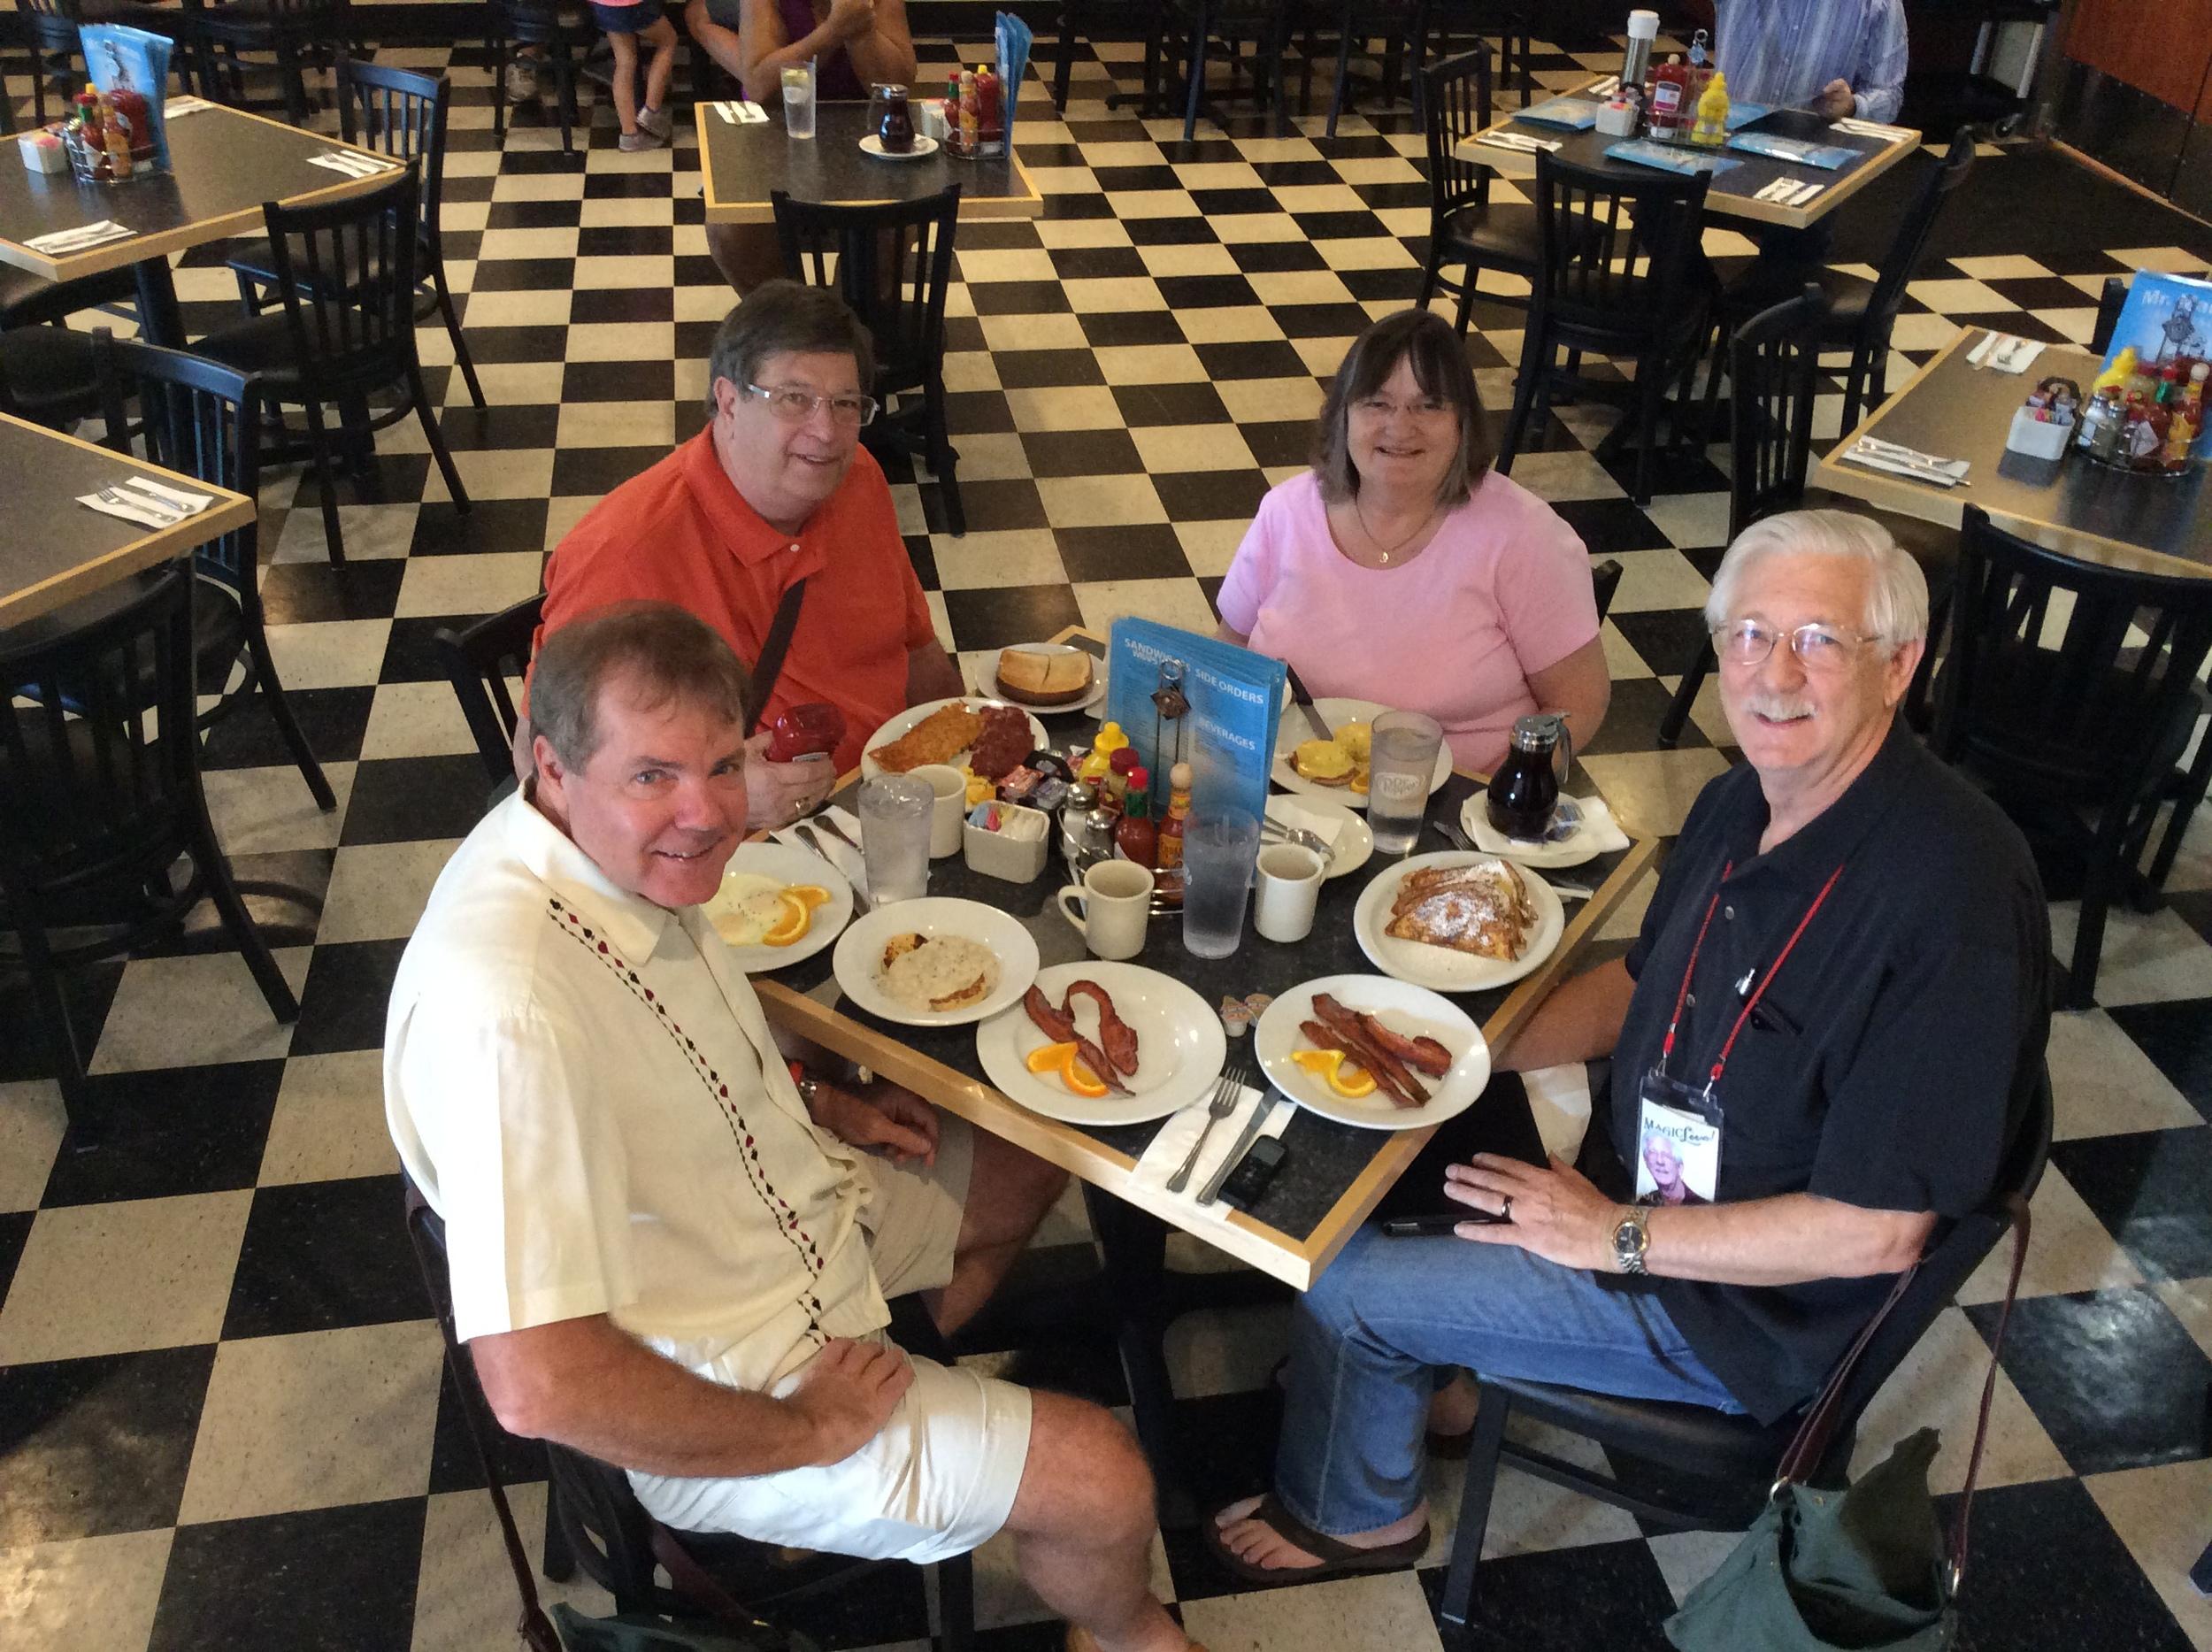 (left to right) Scott Wells, David Hinkin, Diane Olson and Dick Olson